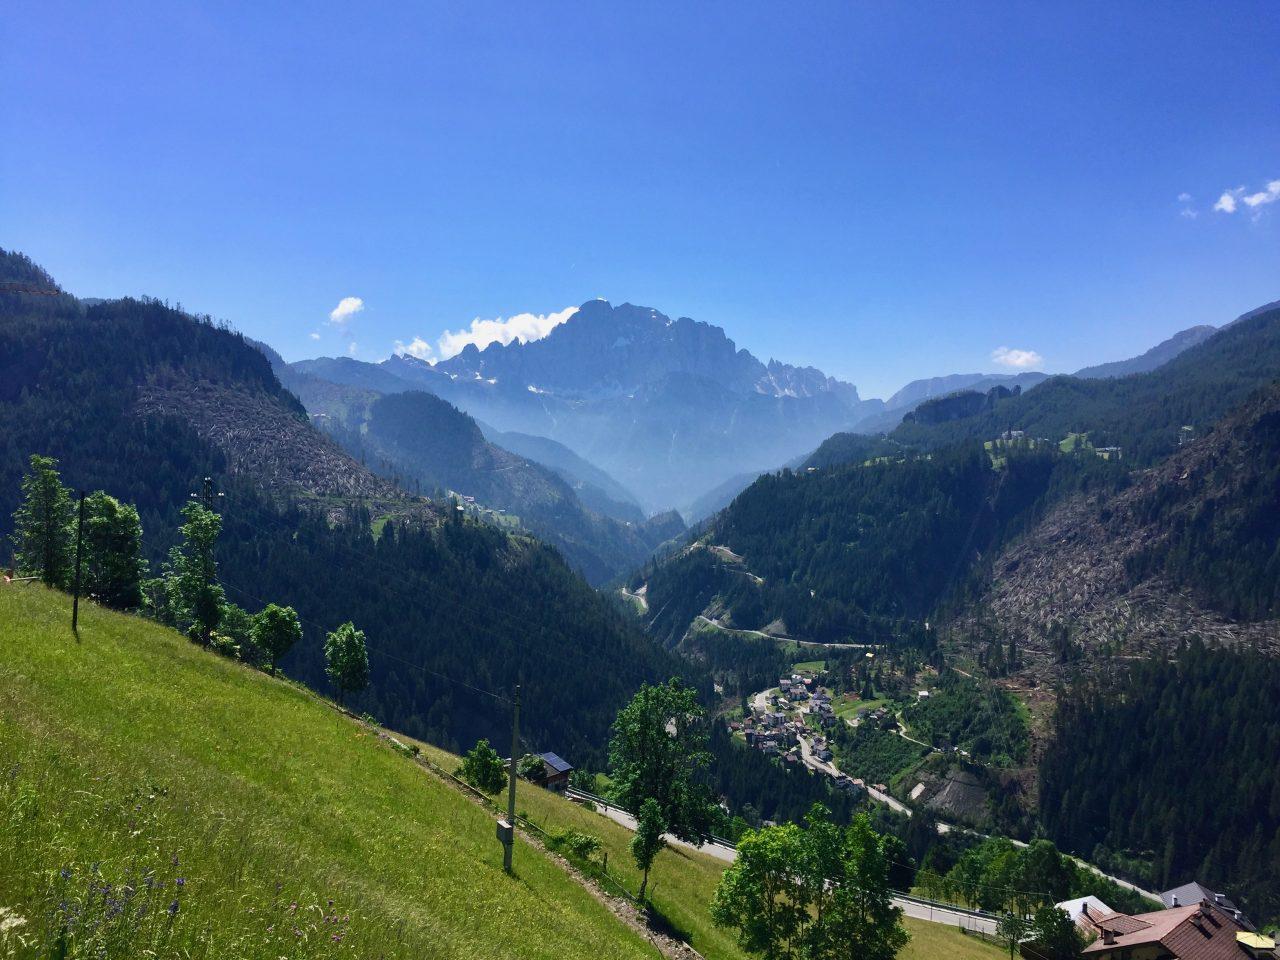 Anfahrt zum Passo Falzarego, Dolomites, Italy